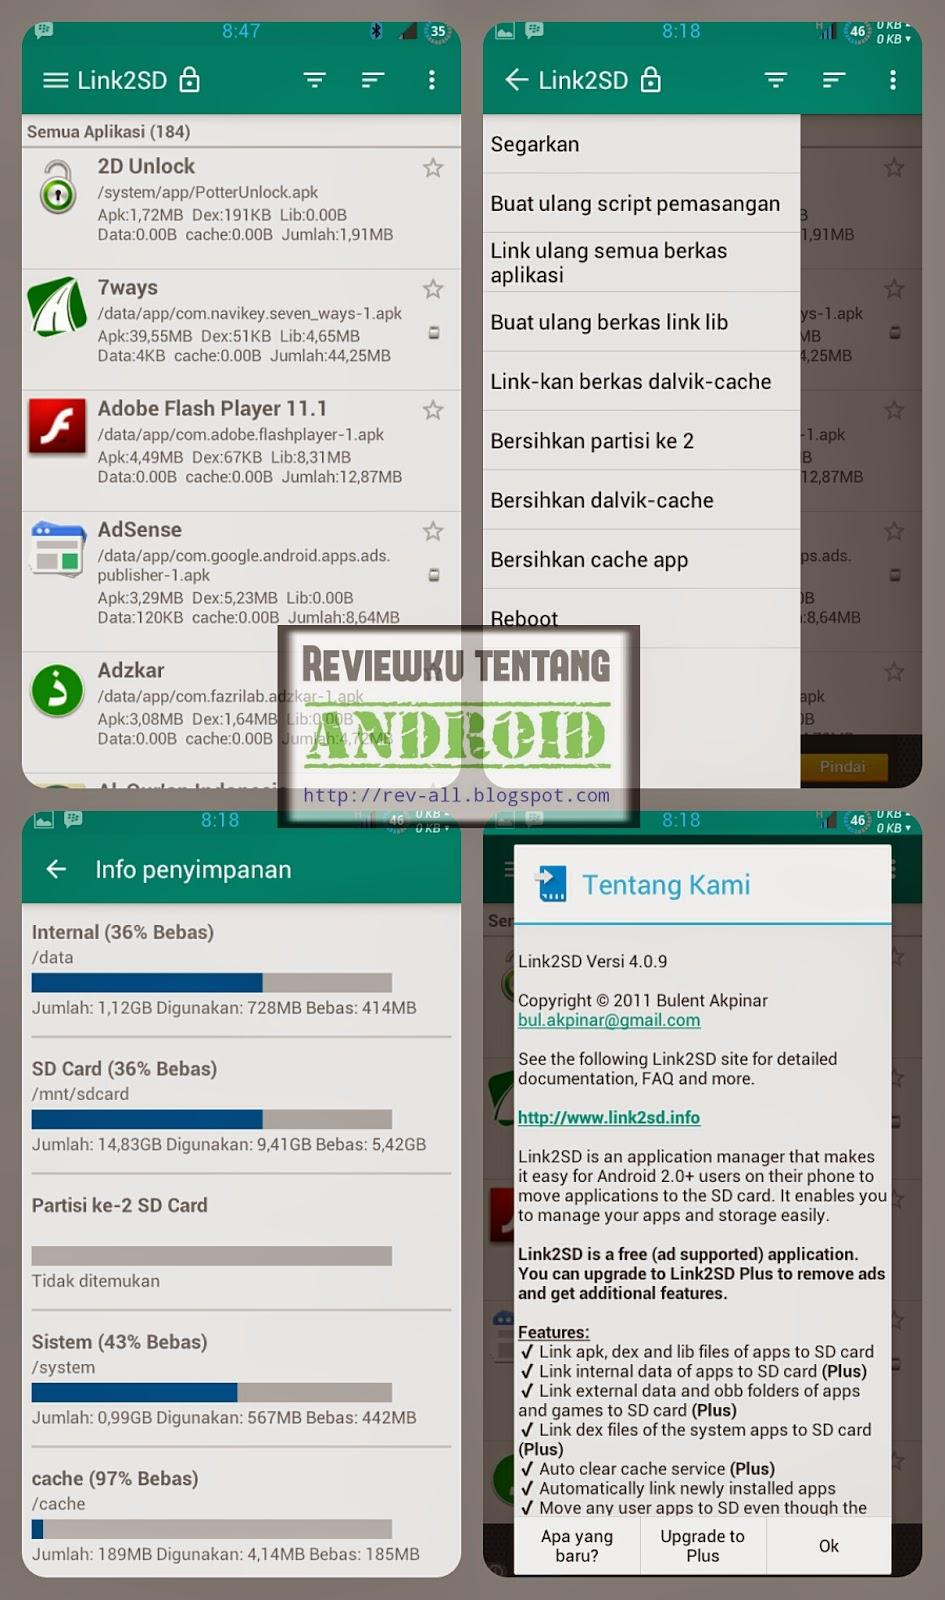 Tampilan  aplikasi Link2SD - Pindah aplikasi ke memori SD, hapus aplikasi sistem, dll dengan mudah (rev-all.blogspot.com)